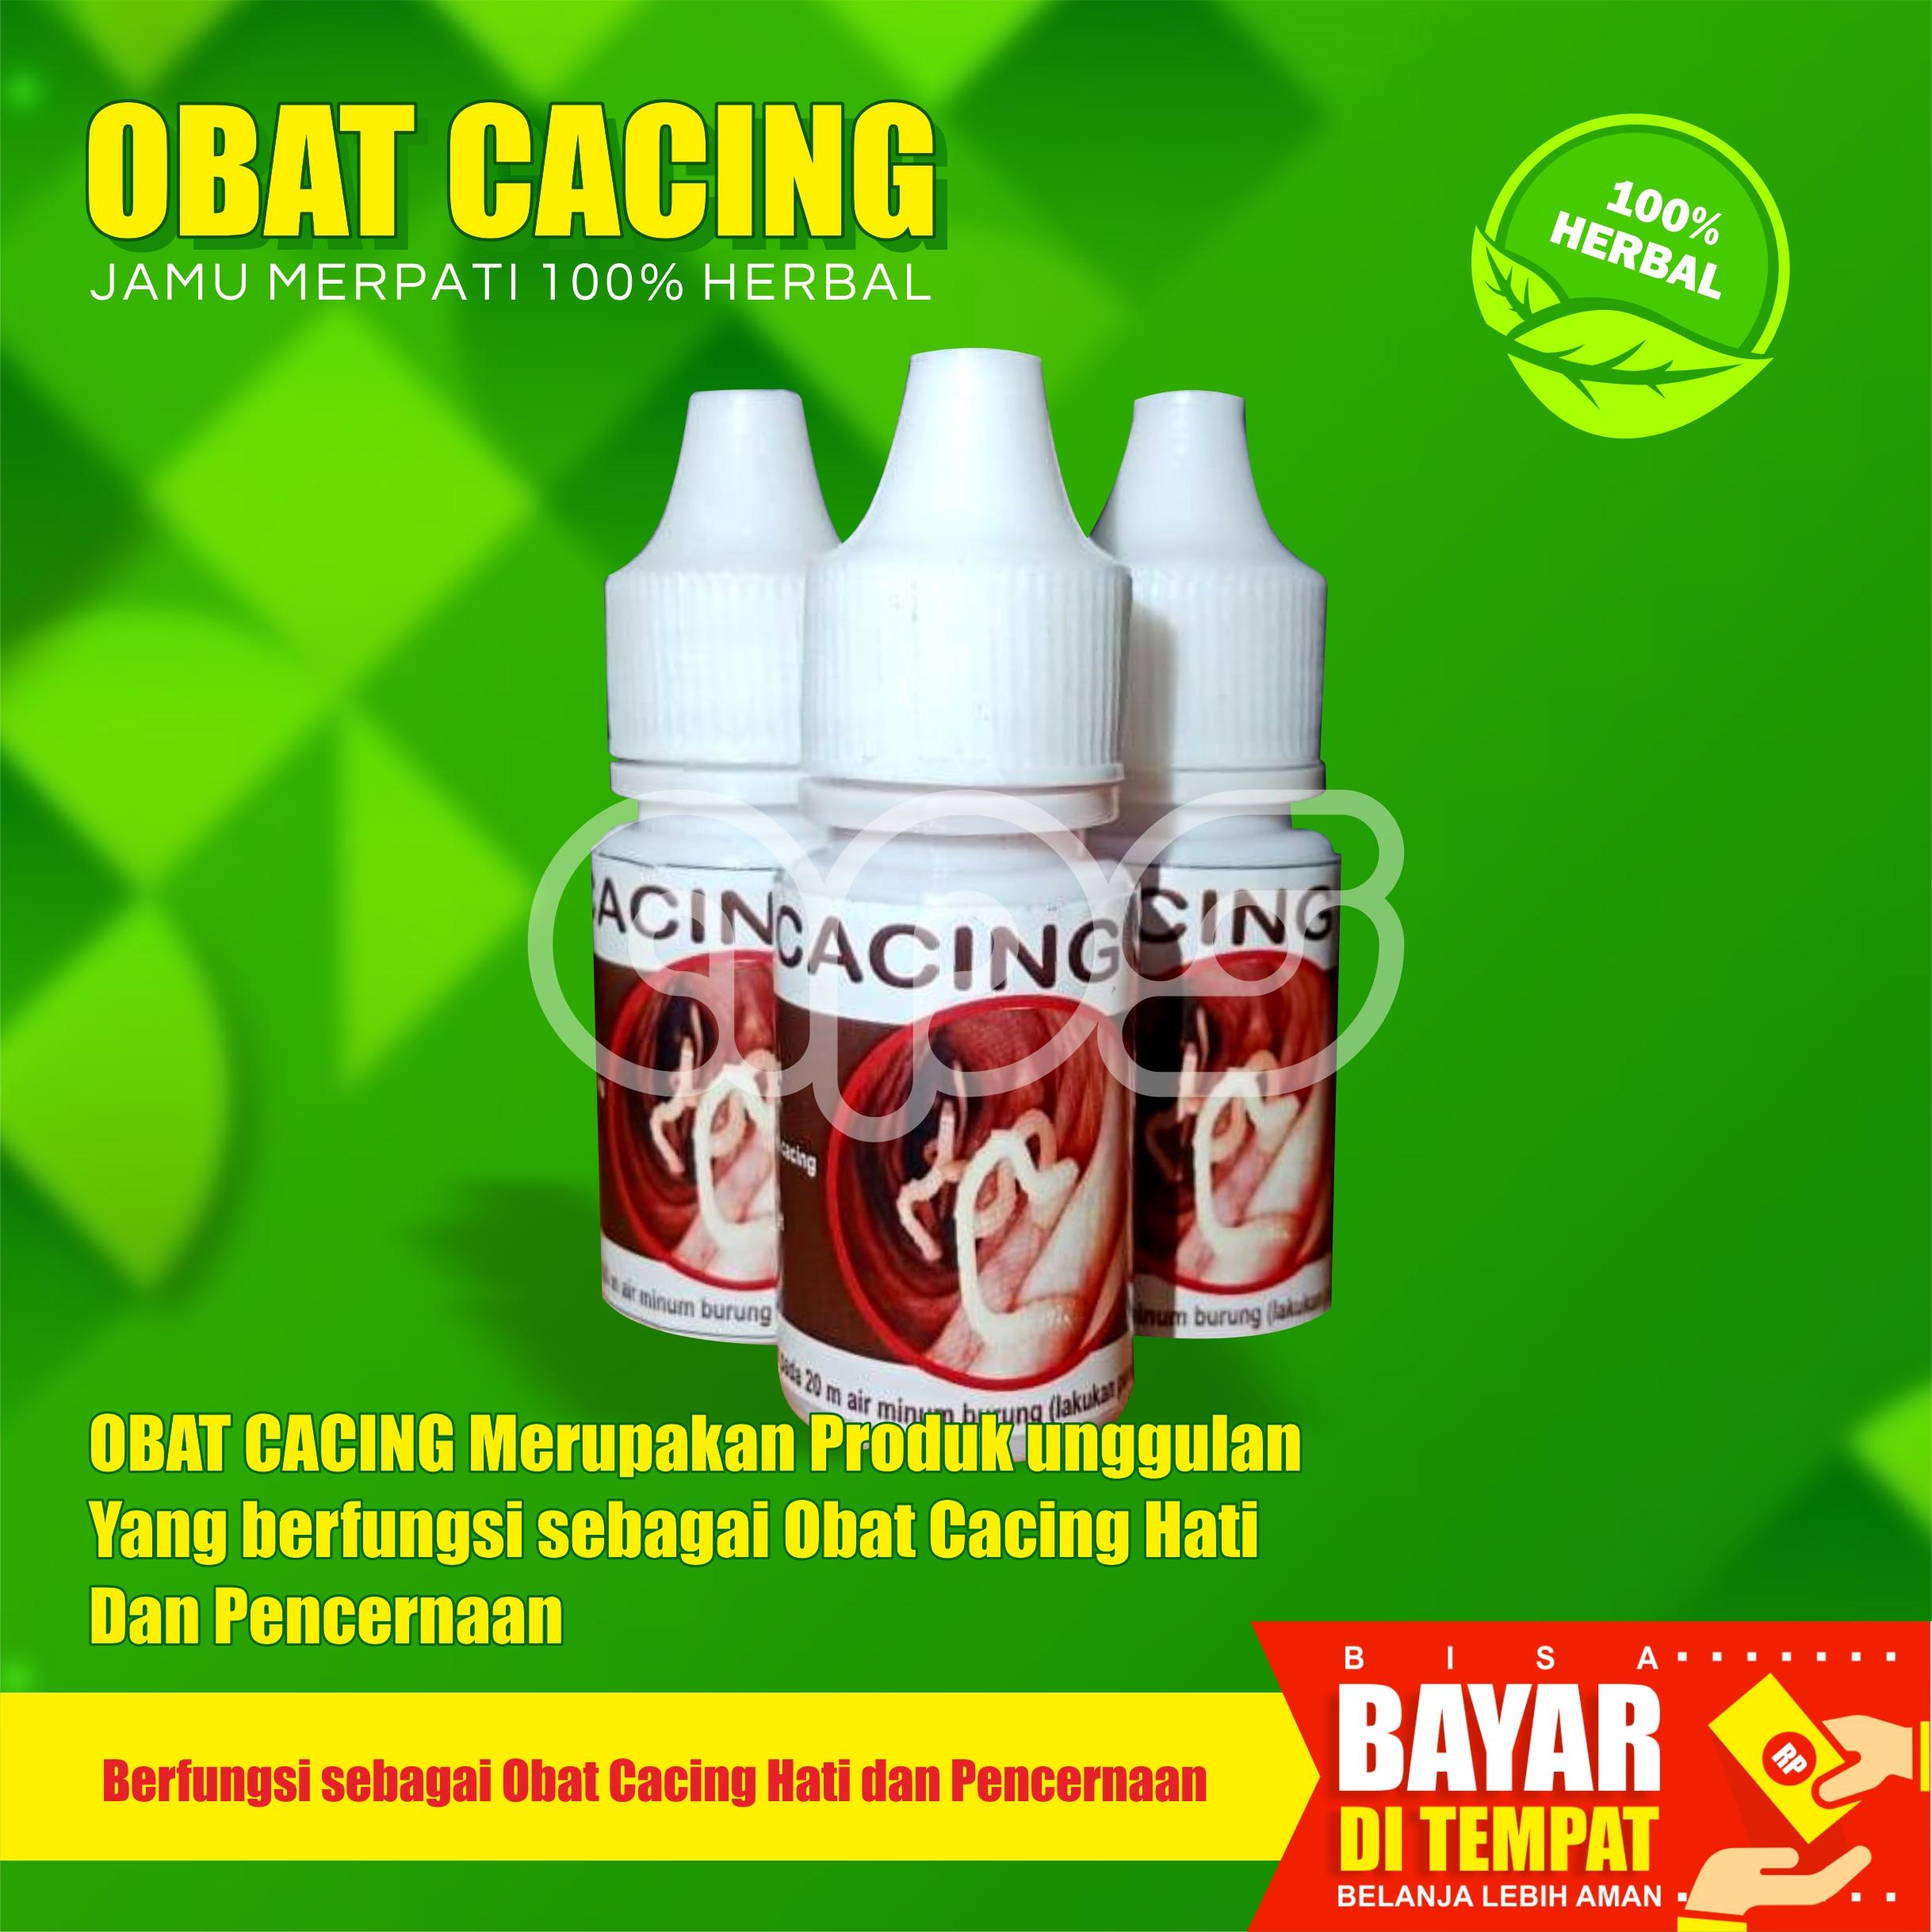 Obat Cacing Burung Merpati Ampuh Aman Obat Pembasmi Cacing Burung Obat Cacing Khusus Merpati Lazada Indonesia